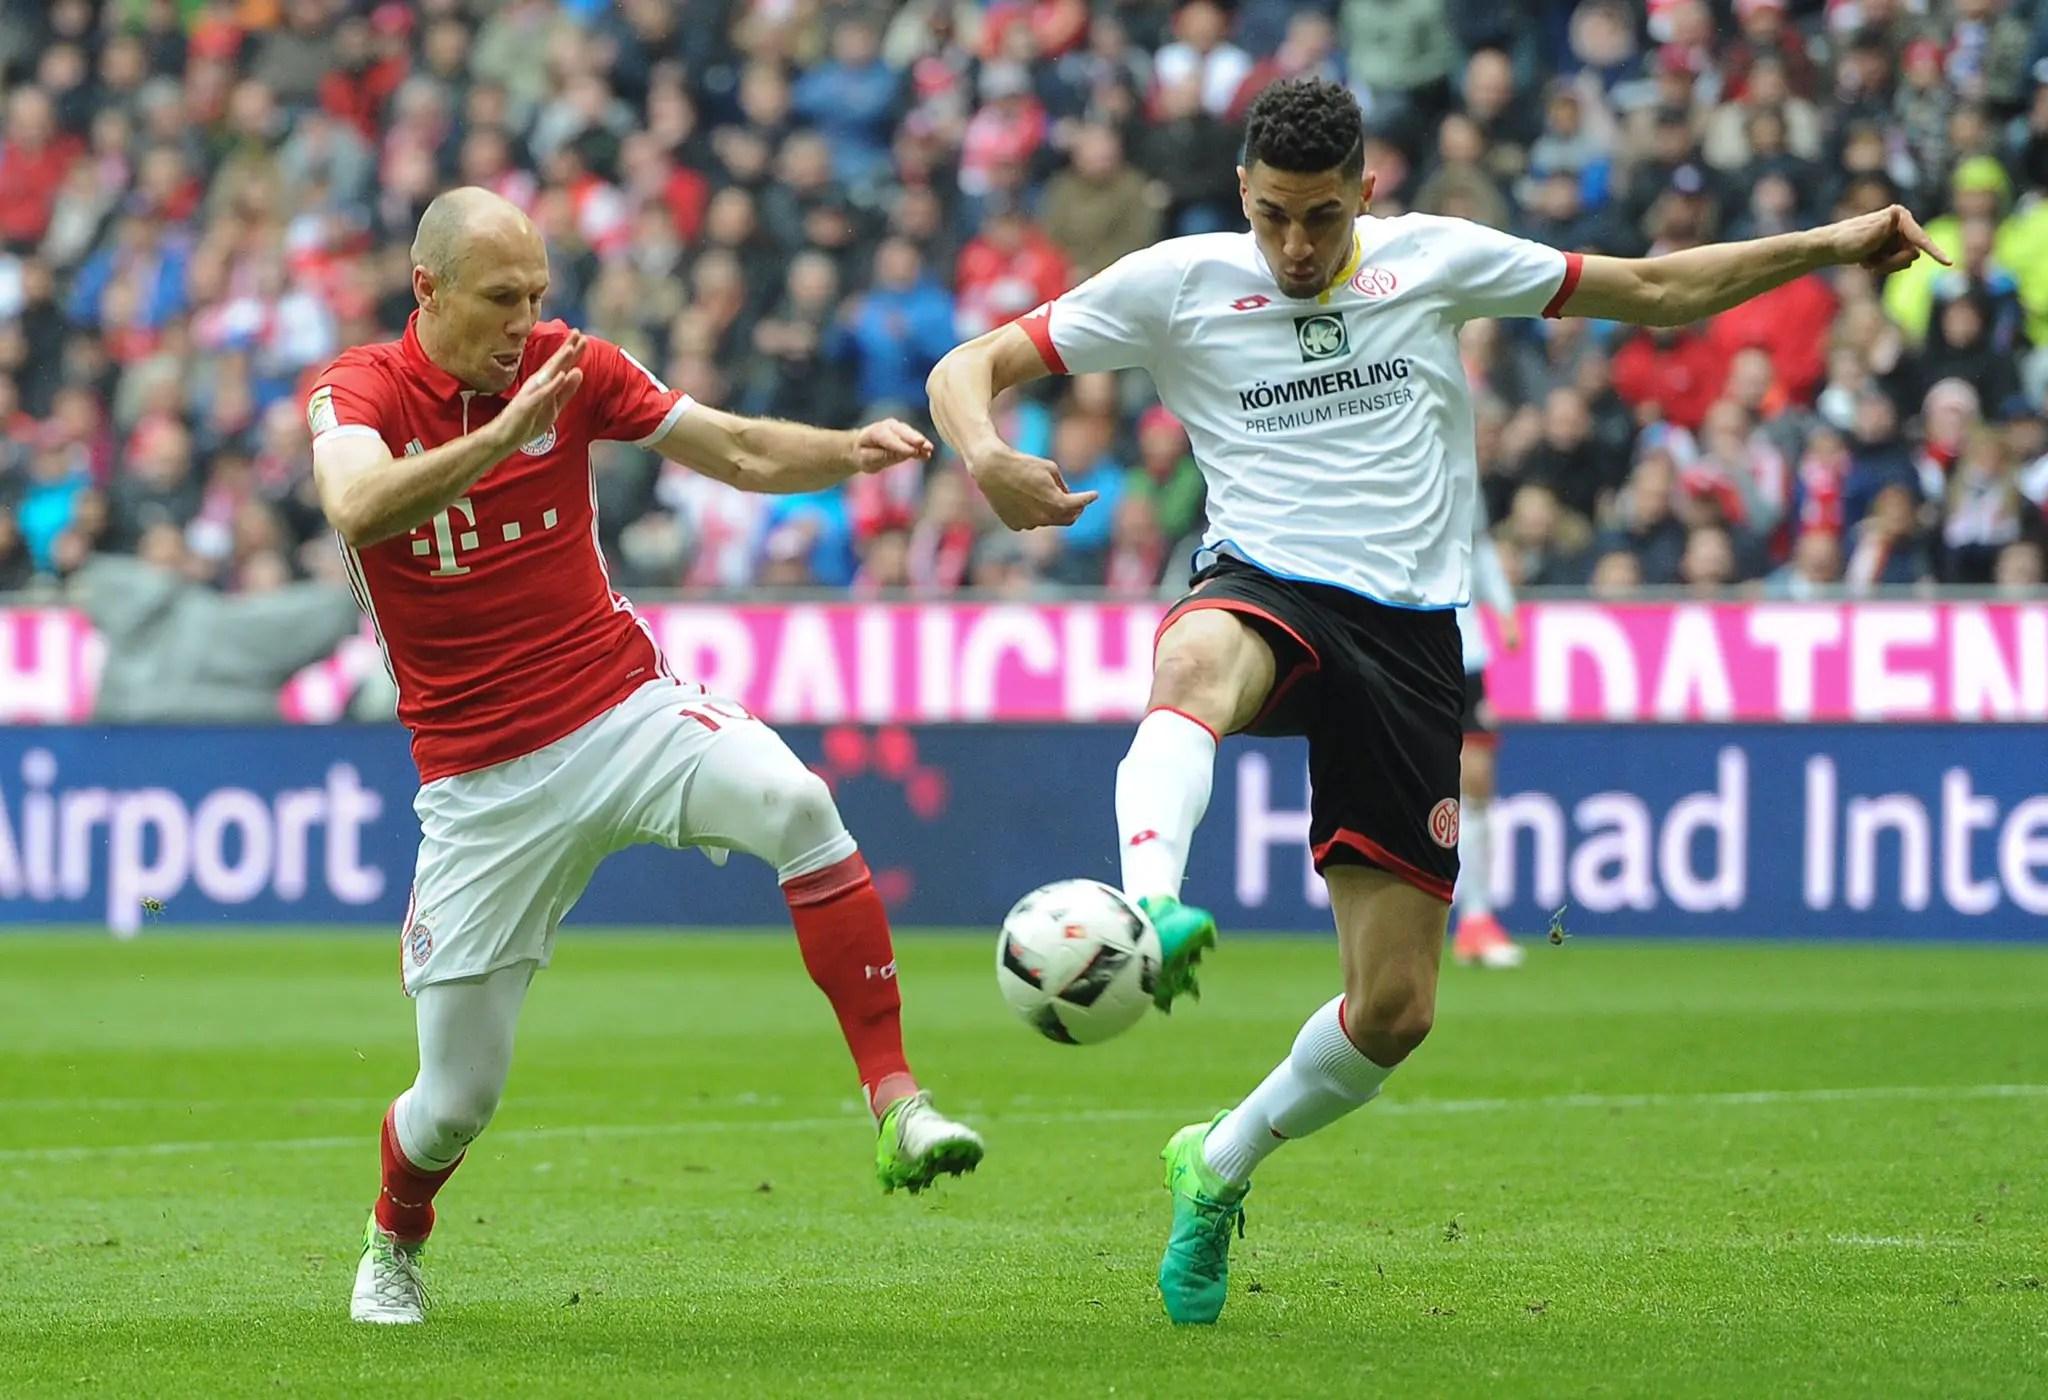 Osimhen Makes 2nd Bundesliga Appearance As Wolfsburg Face Relegation Playoff, Balogun Injured